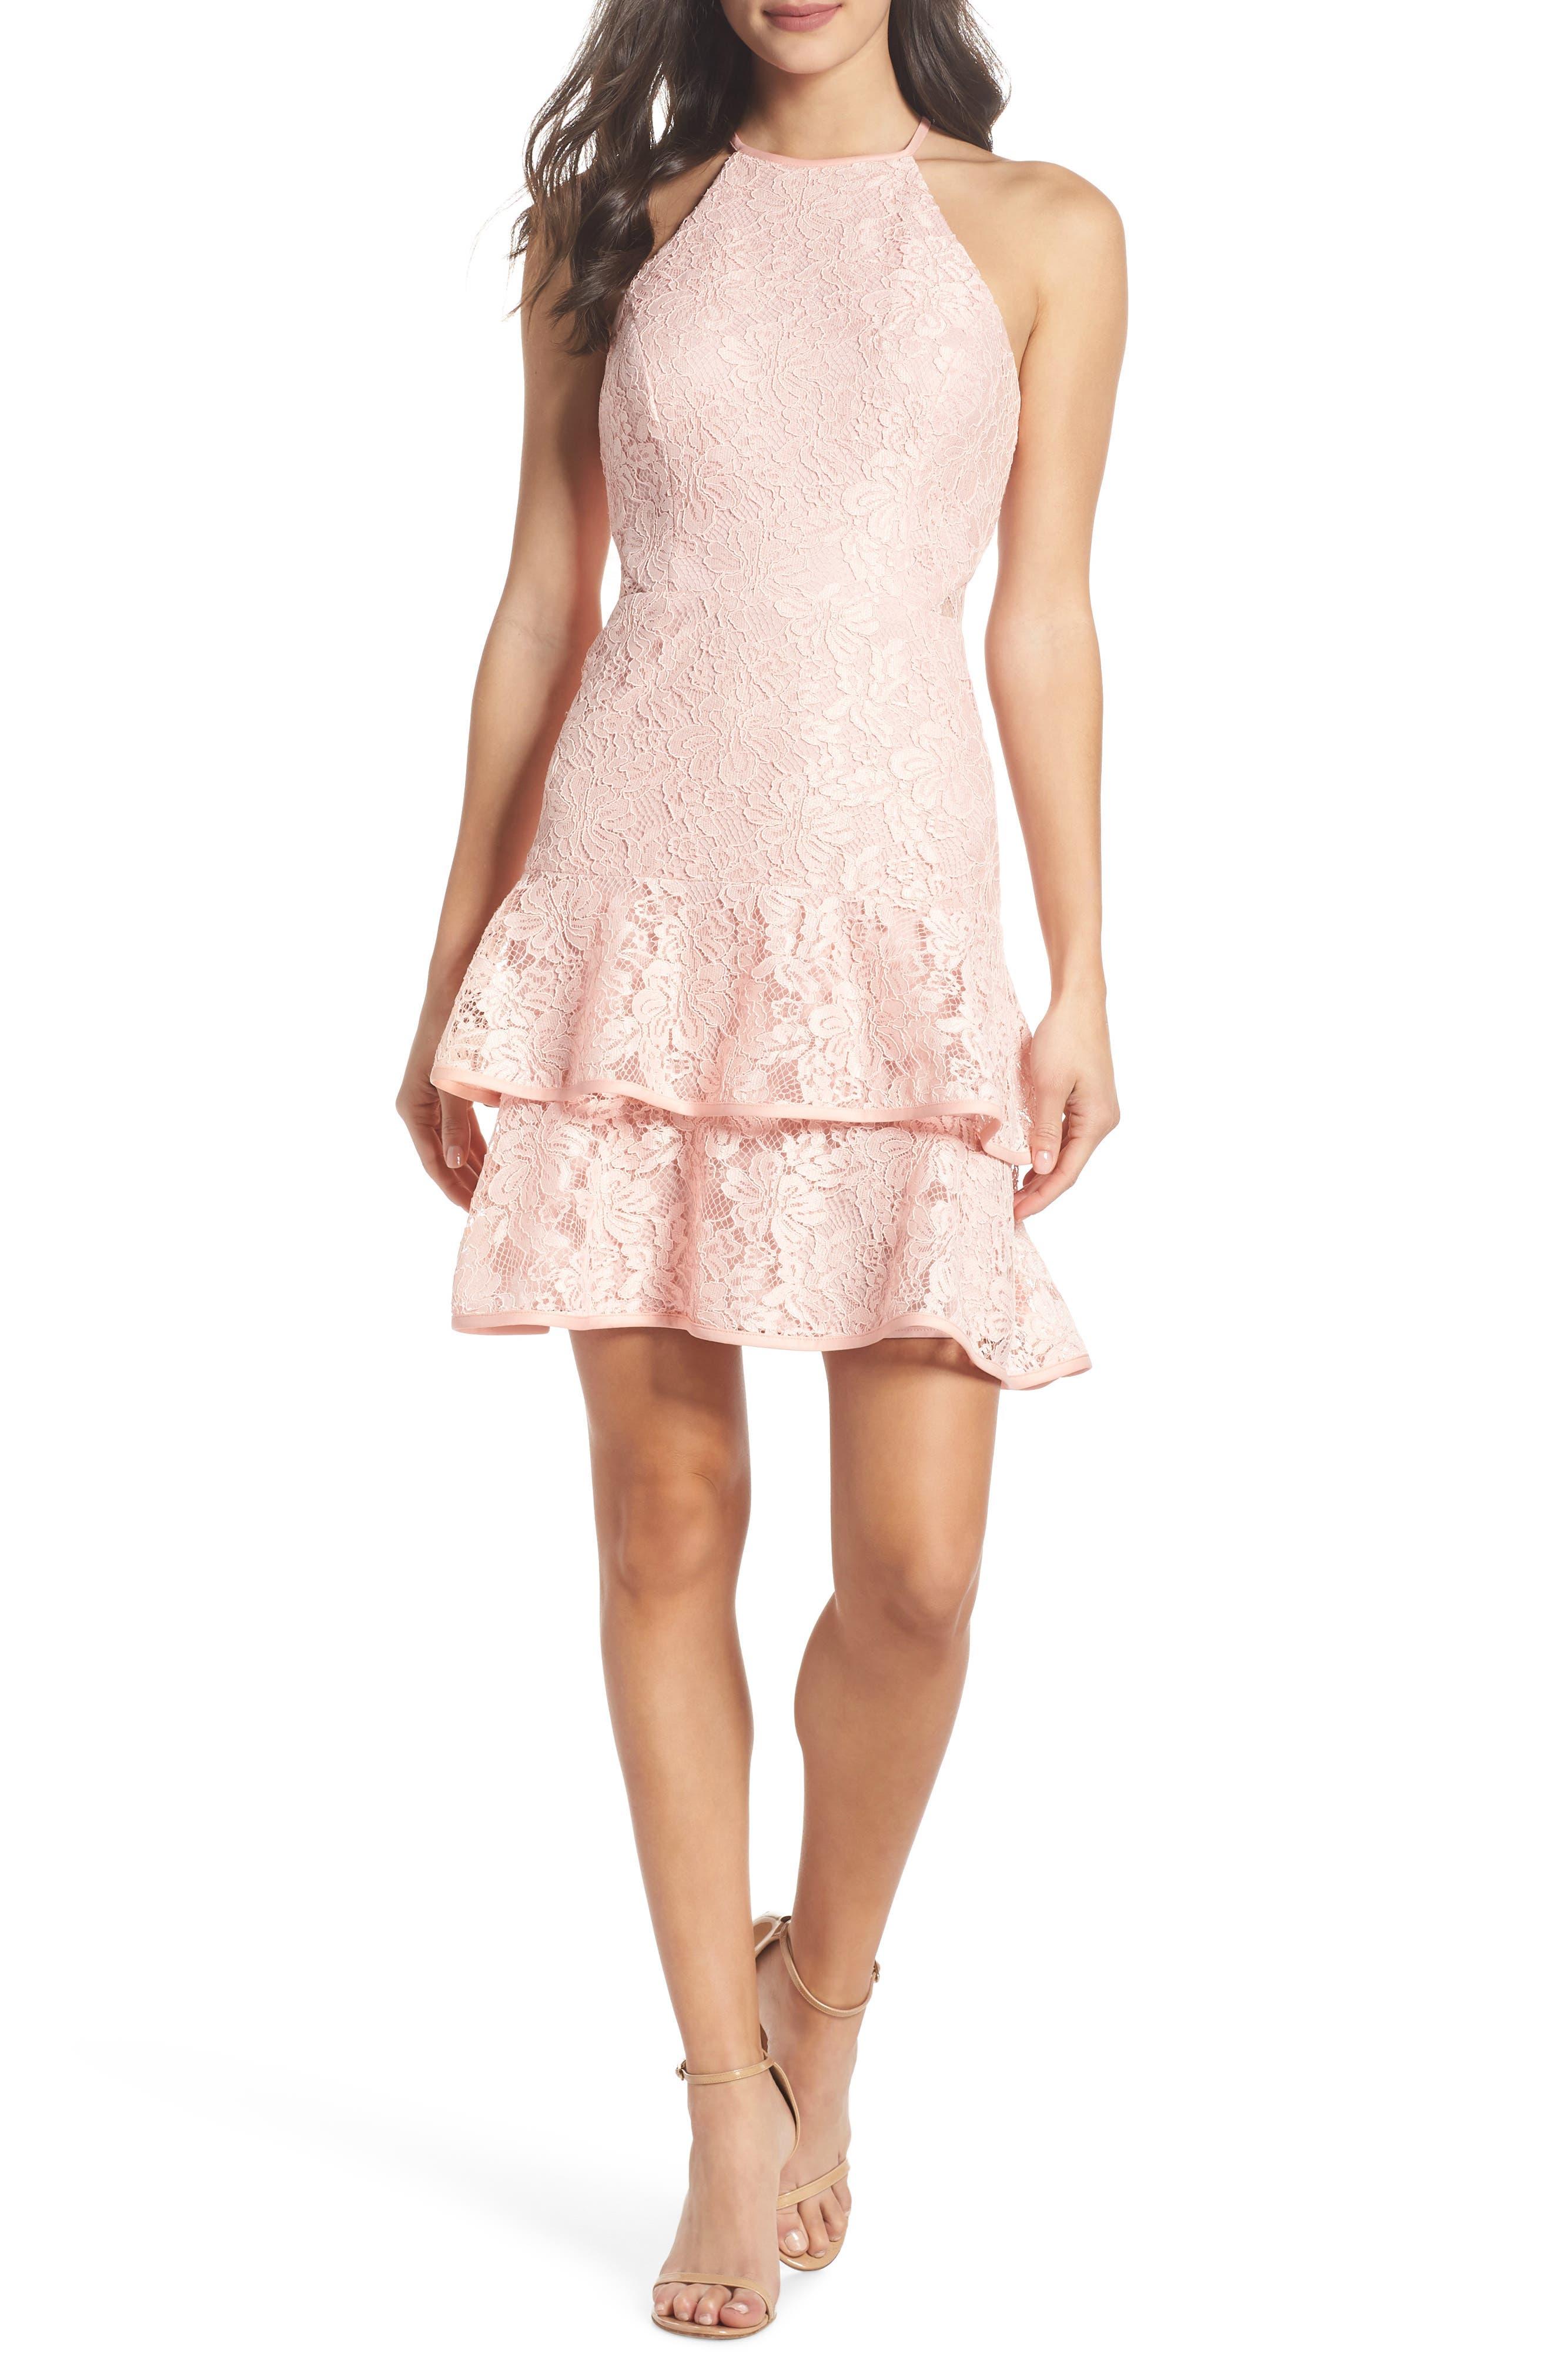 Ruffle Tier Lace Party Dress,                             Main thumbnail 1, color,                             680